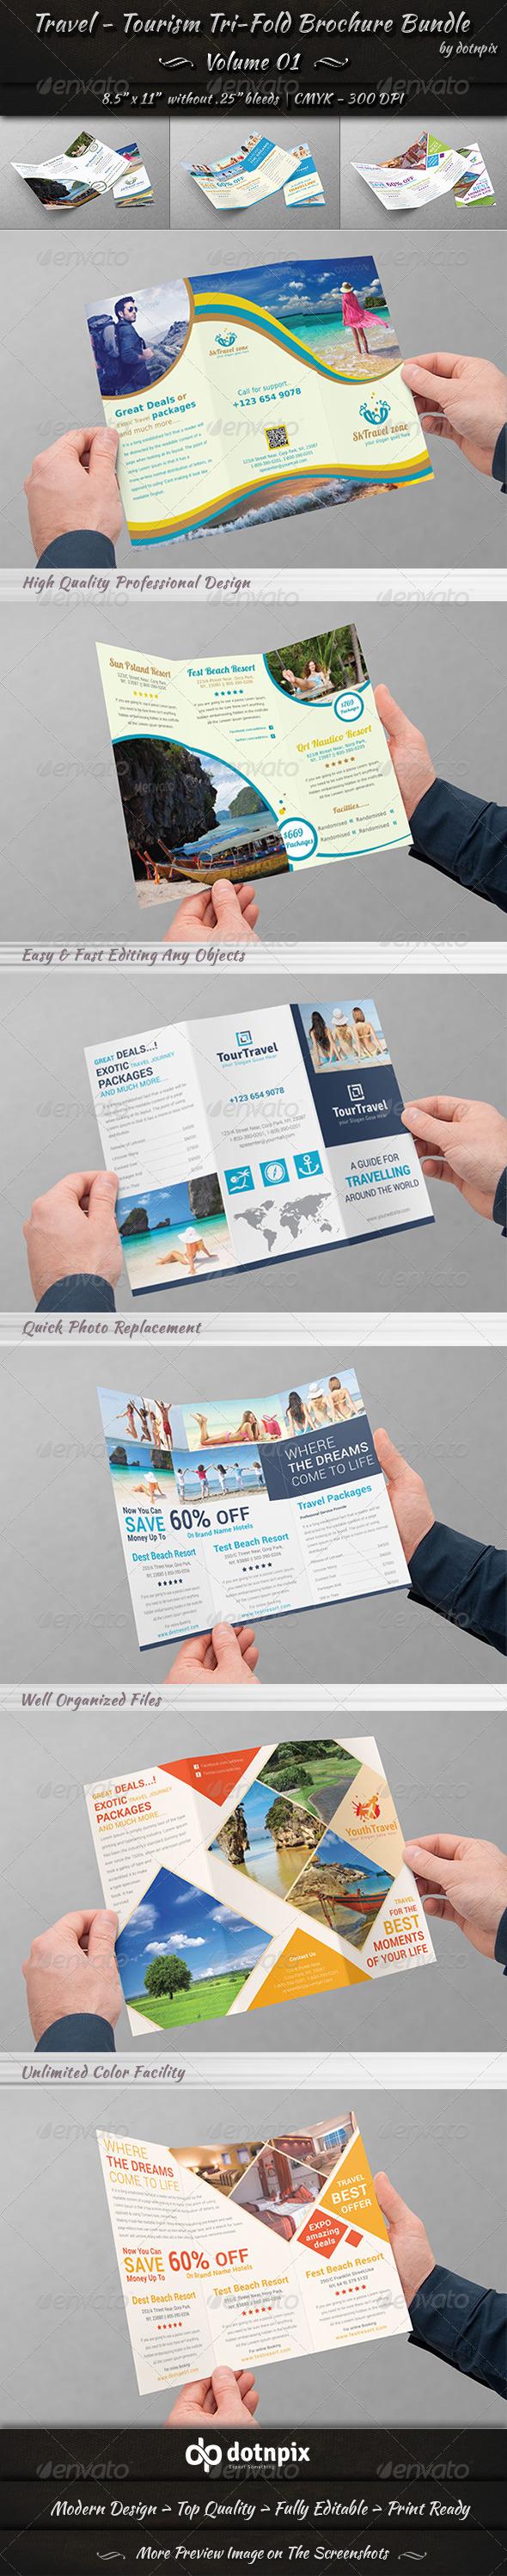 GraphicRiver Travel Tourism Tri-Fold Brochure Bundle v1 8116959